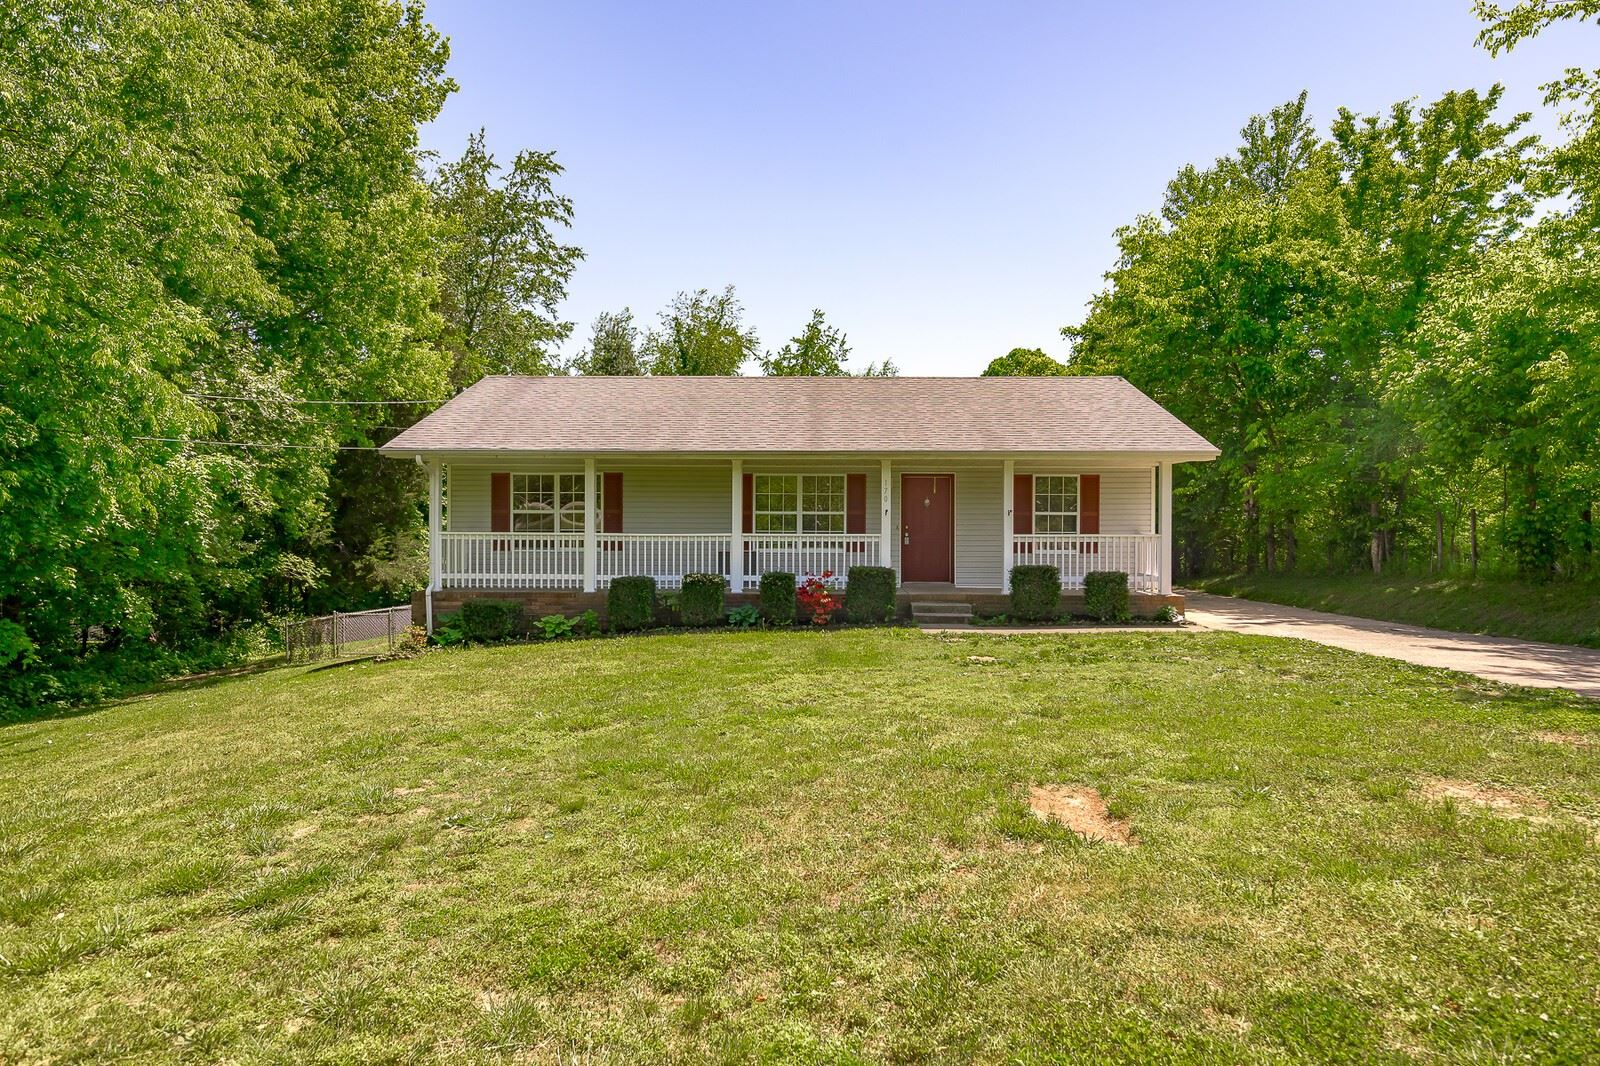 170 Cummings Creek Rd, Clarksville, TN 37042 - MLS#: 2253496